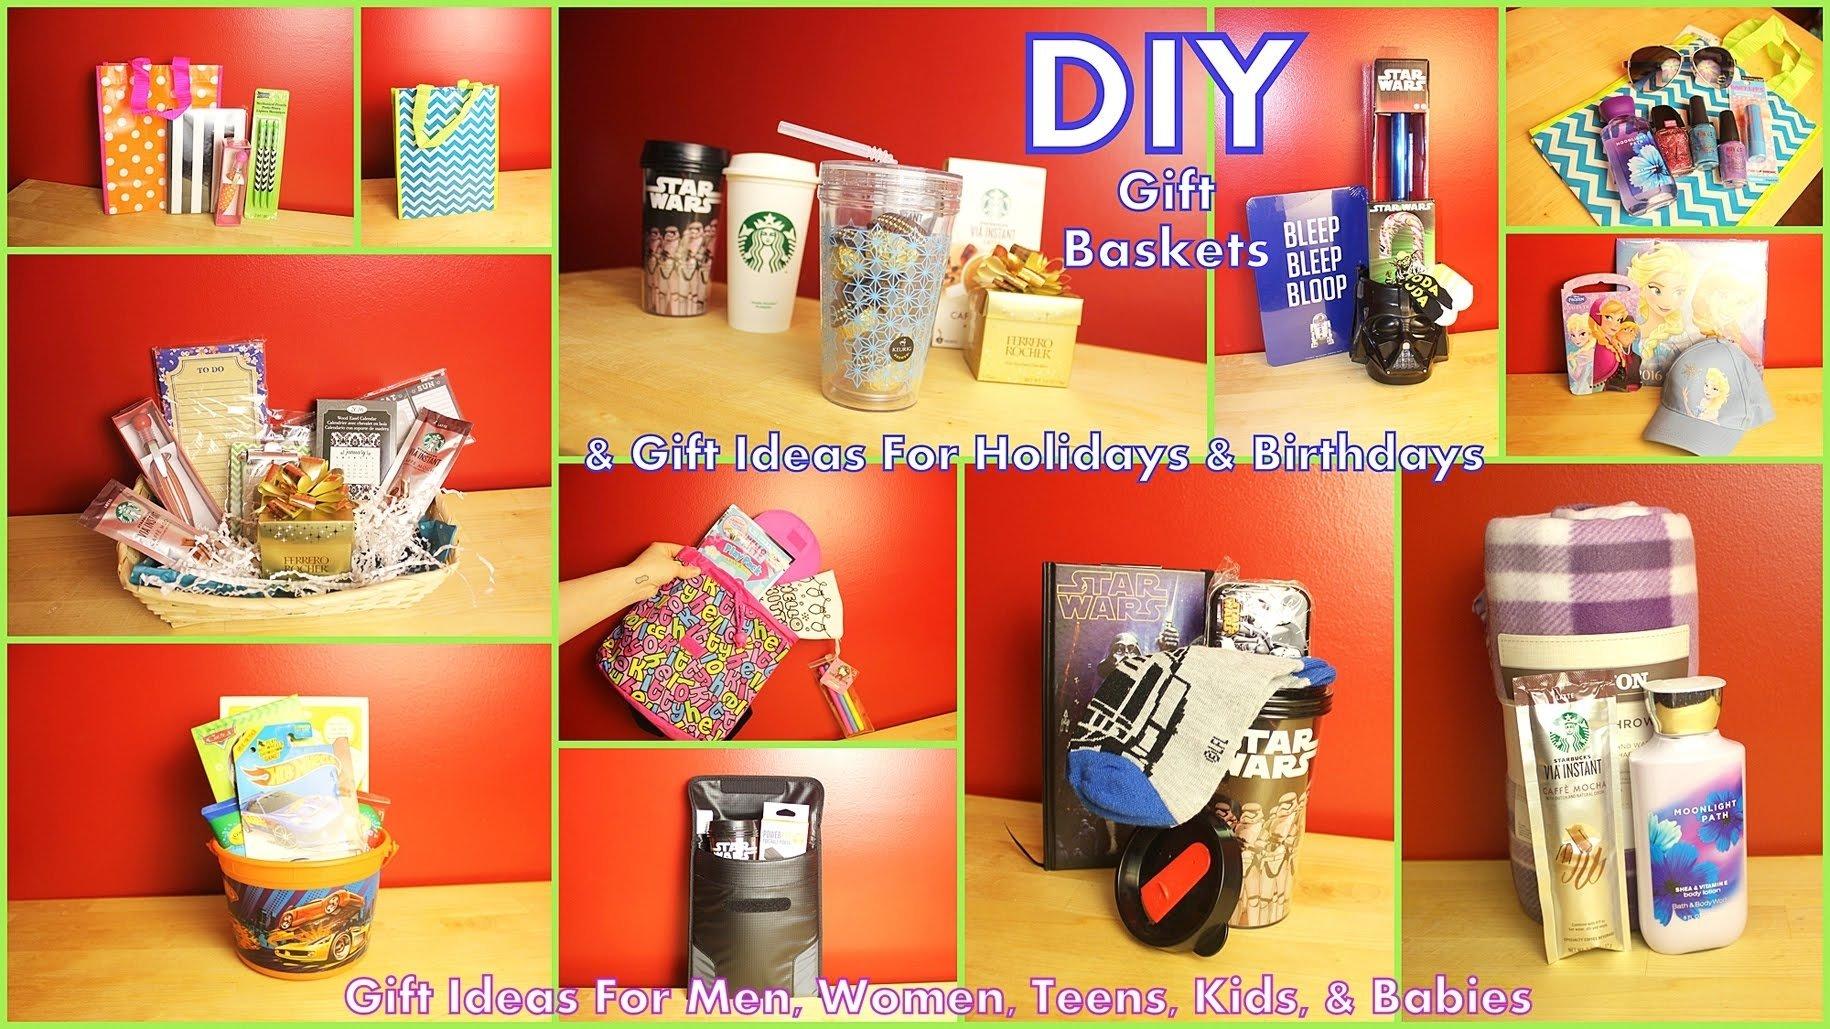 10 Beautiful Easter Basket Ideas For Men diy gift baskets gift ideas how to assemble for men women kids 11